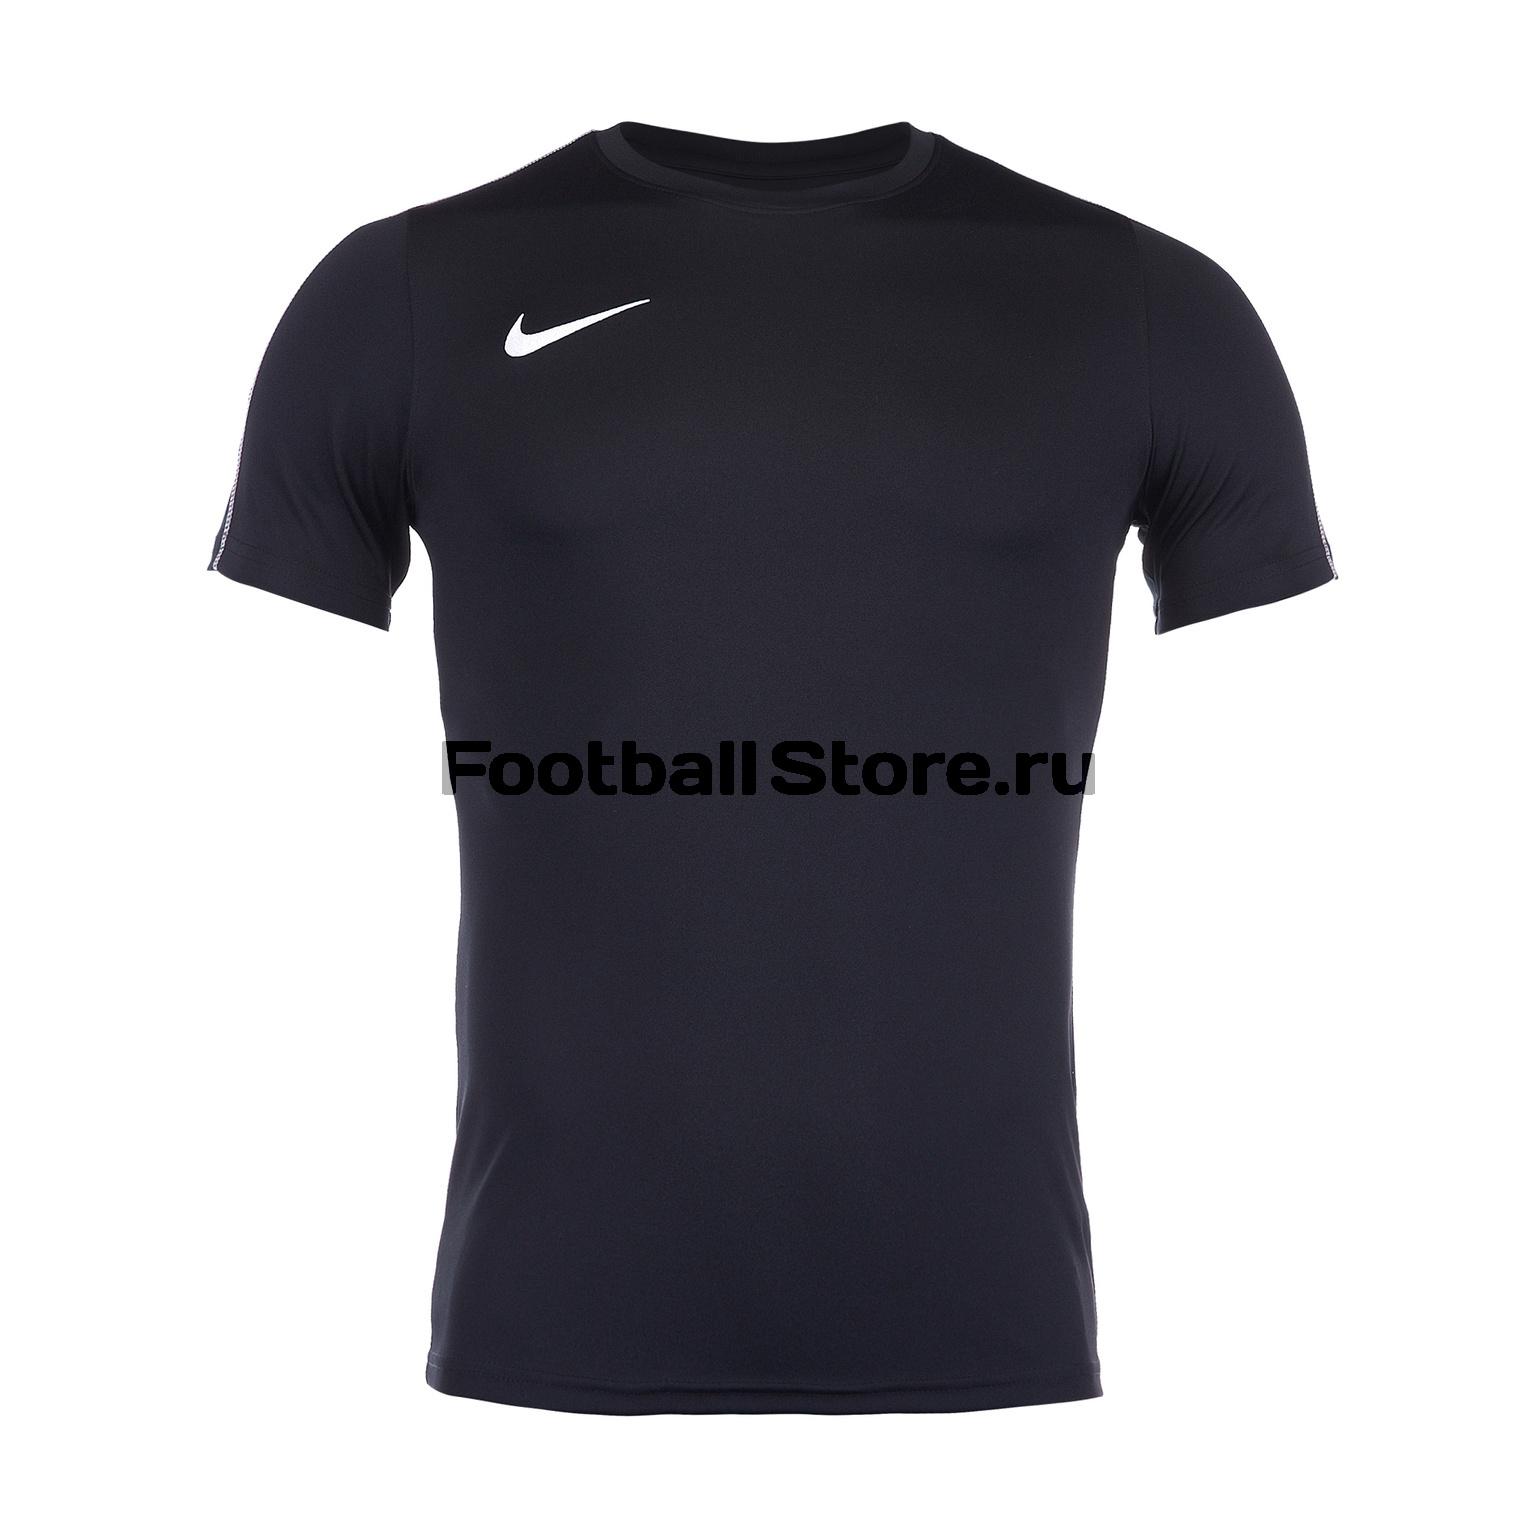 Футболка тренировочная Nike Dry Park18 SS Top AA2046-010 футболка игровая nike dry tiempo prem jsy ss 894230 411